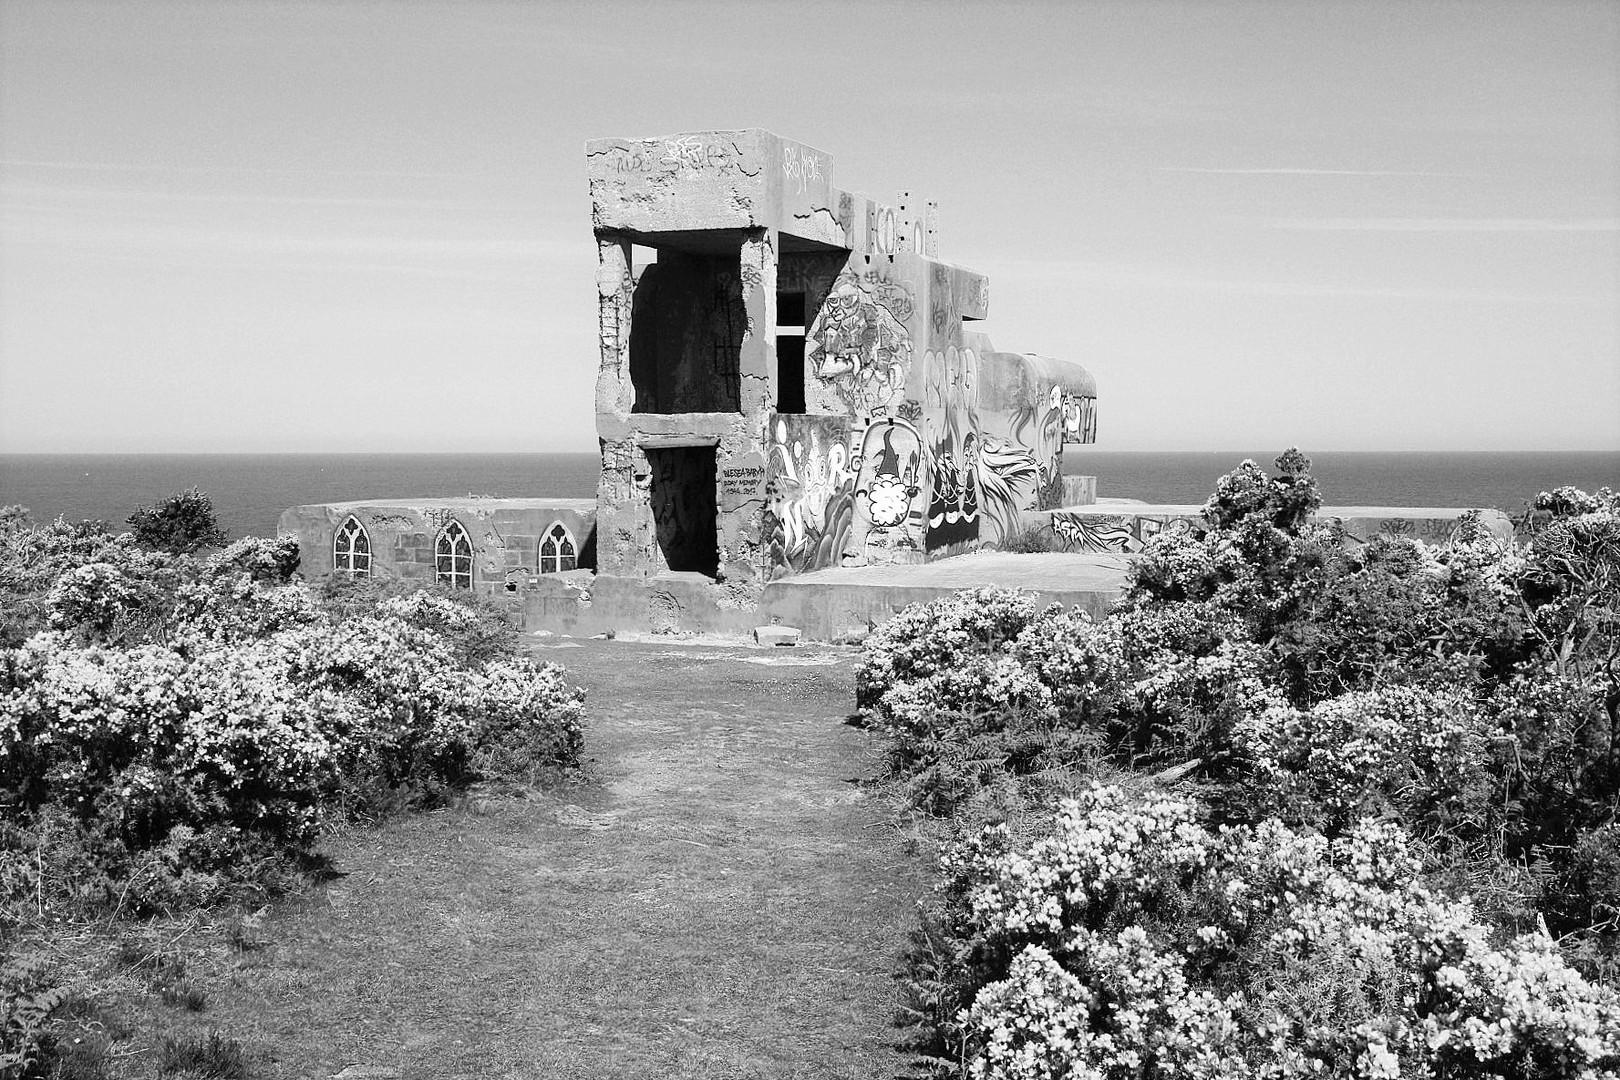 Adolfs Atlantik Wall. Bei Cherbourg. Batterie Seeadler Feuerleitstelle.